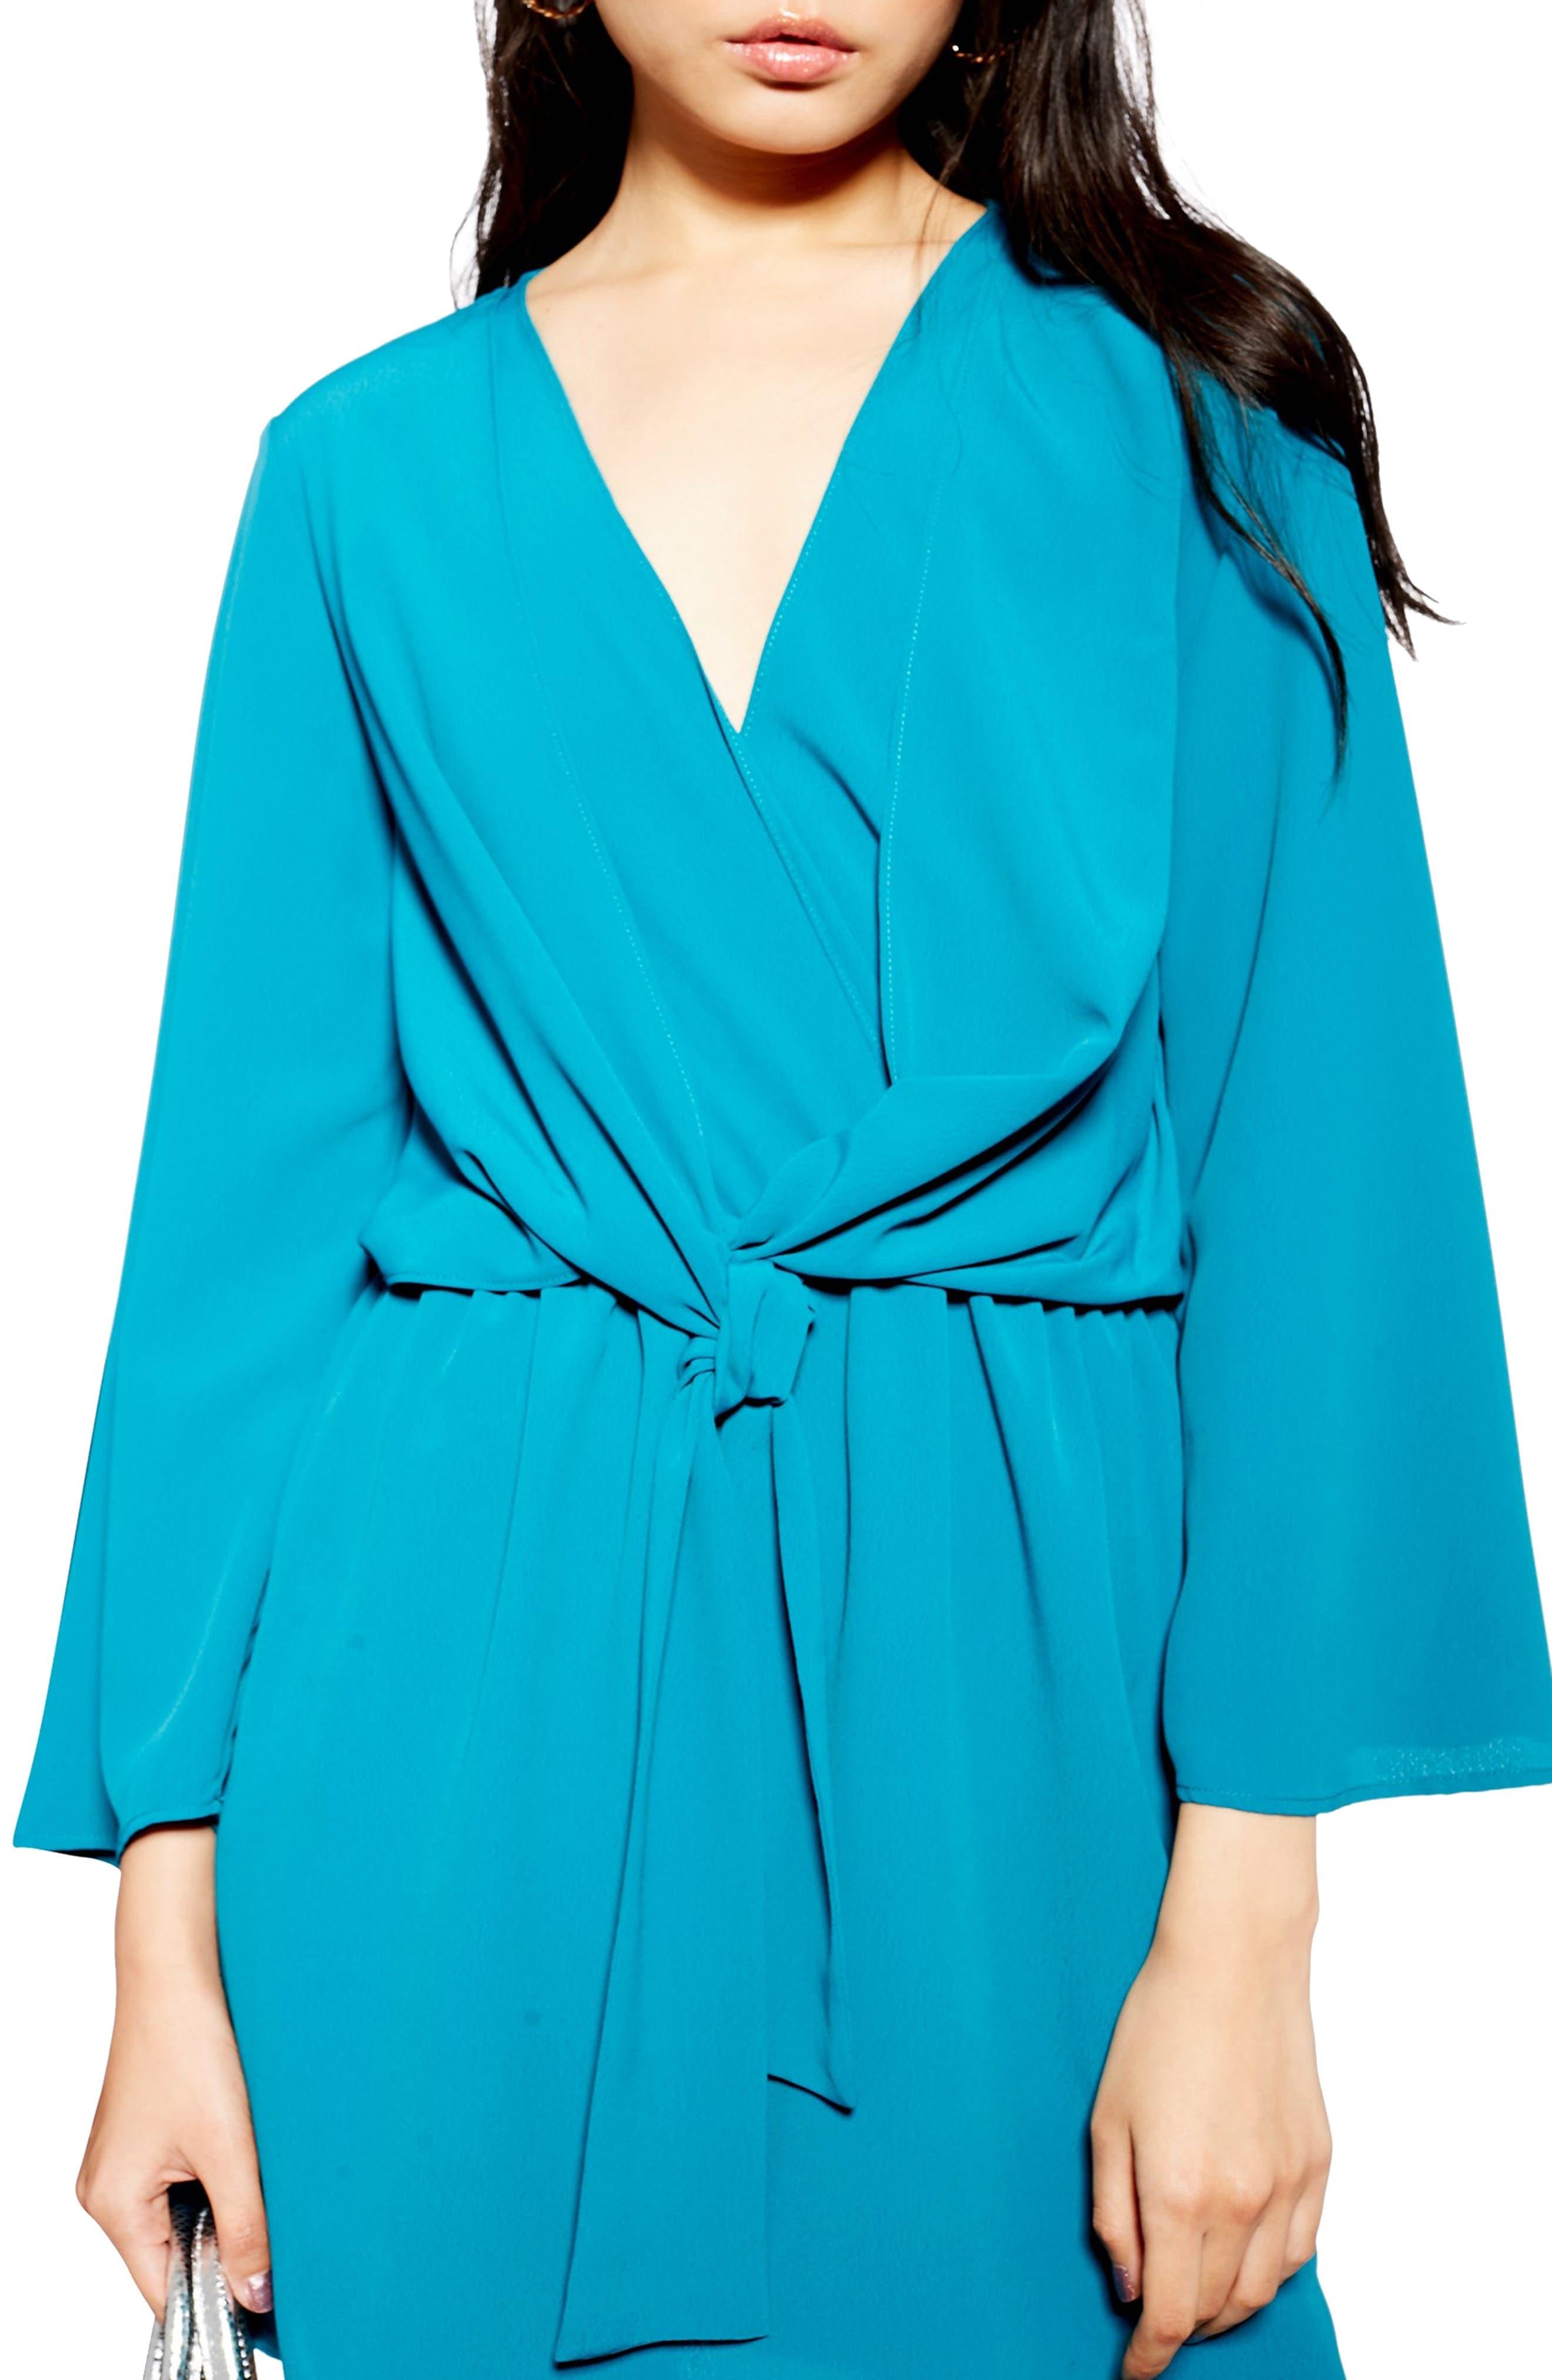 TOPSHOP, Tiffany Knot Minidress, Alternate thumbnail 4, color, TEAL